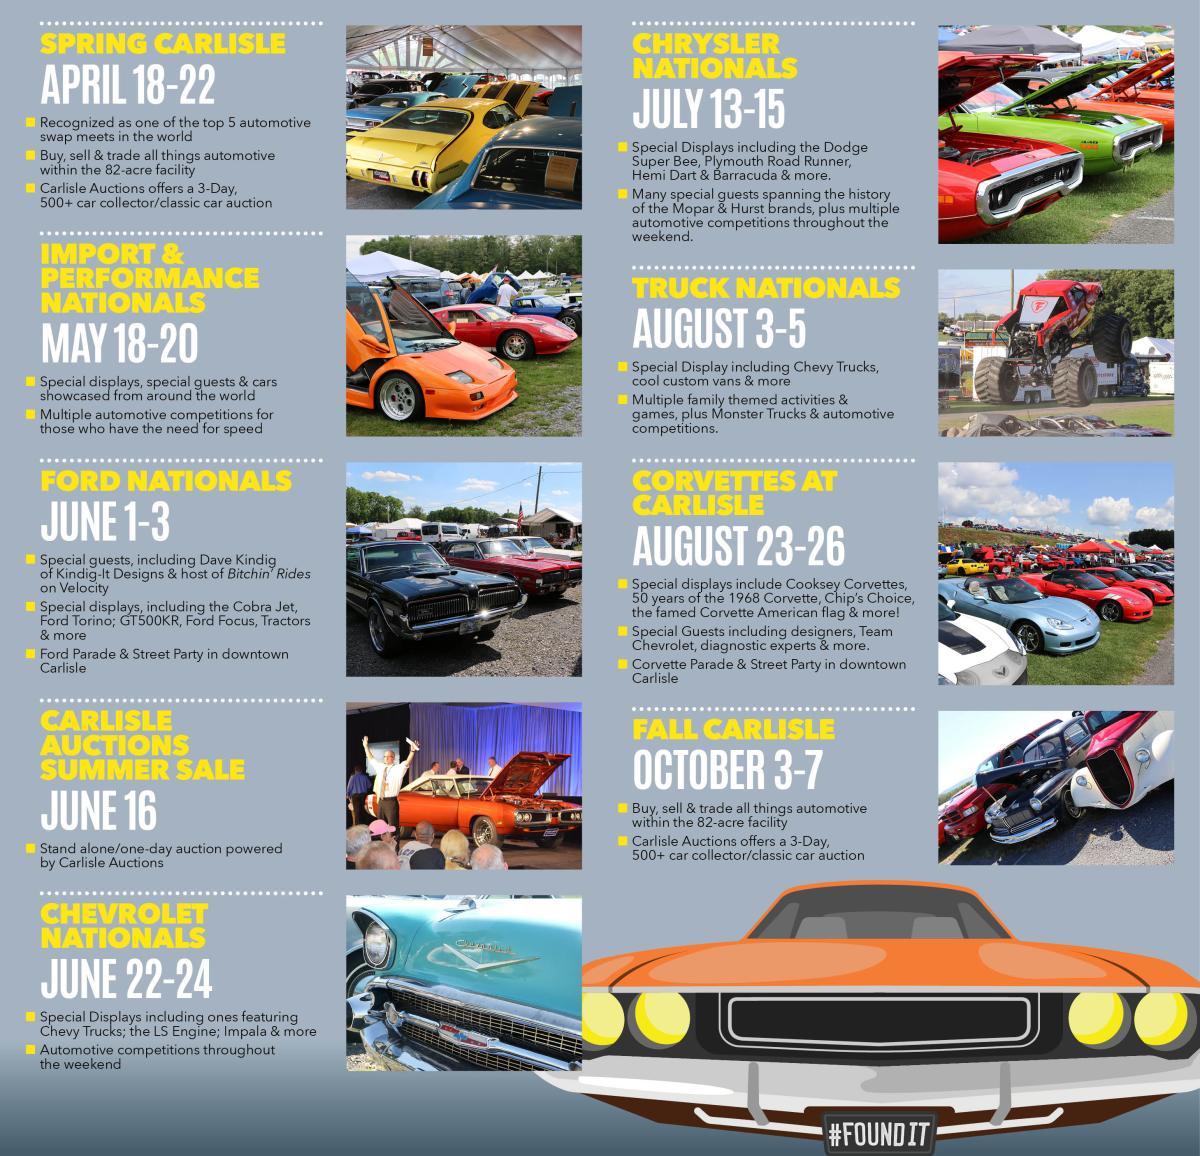 Carlisle Events Car Show Infographic